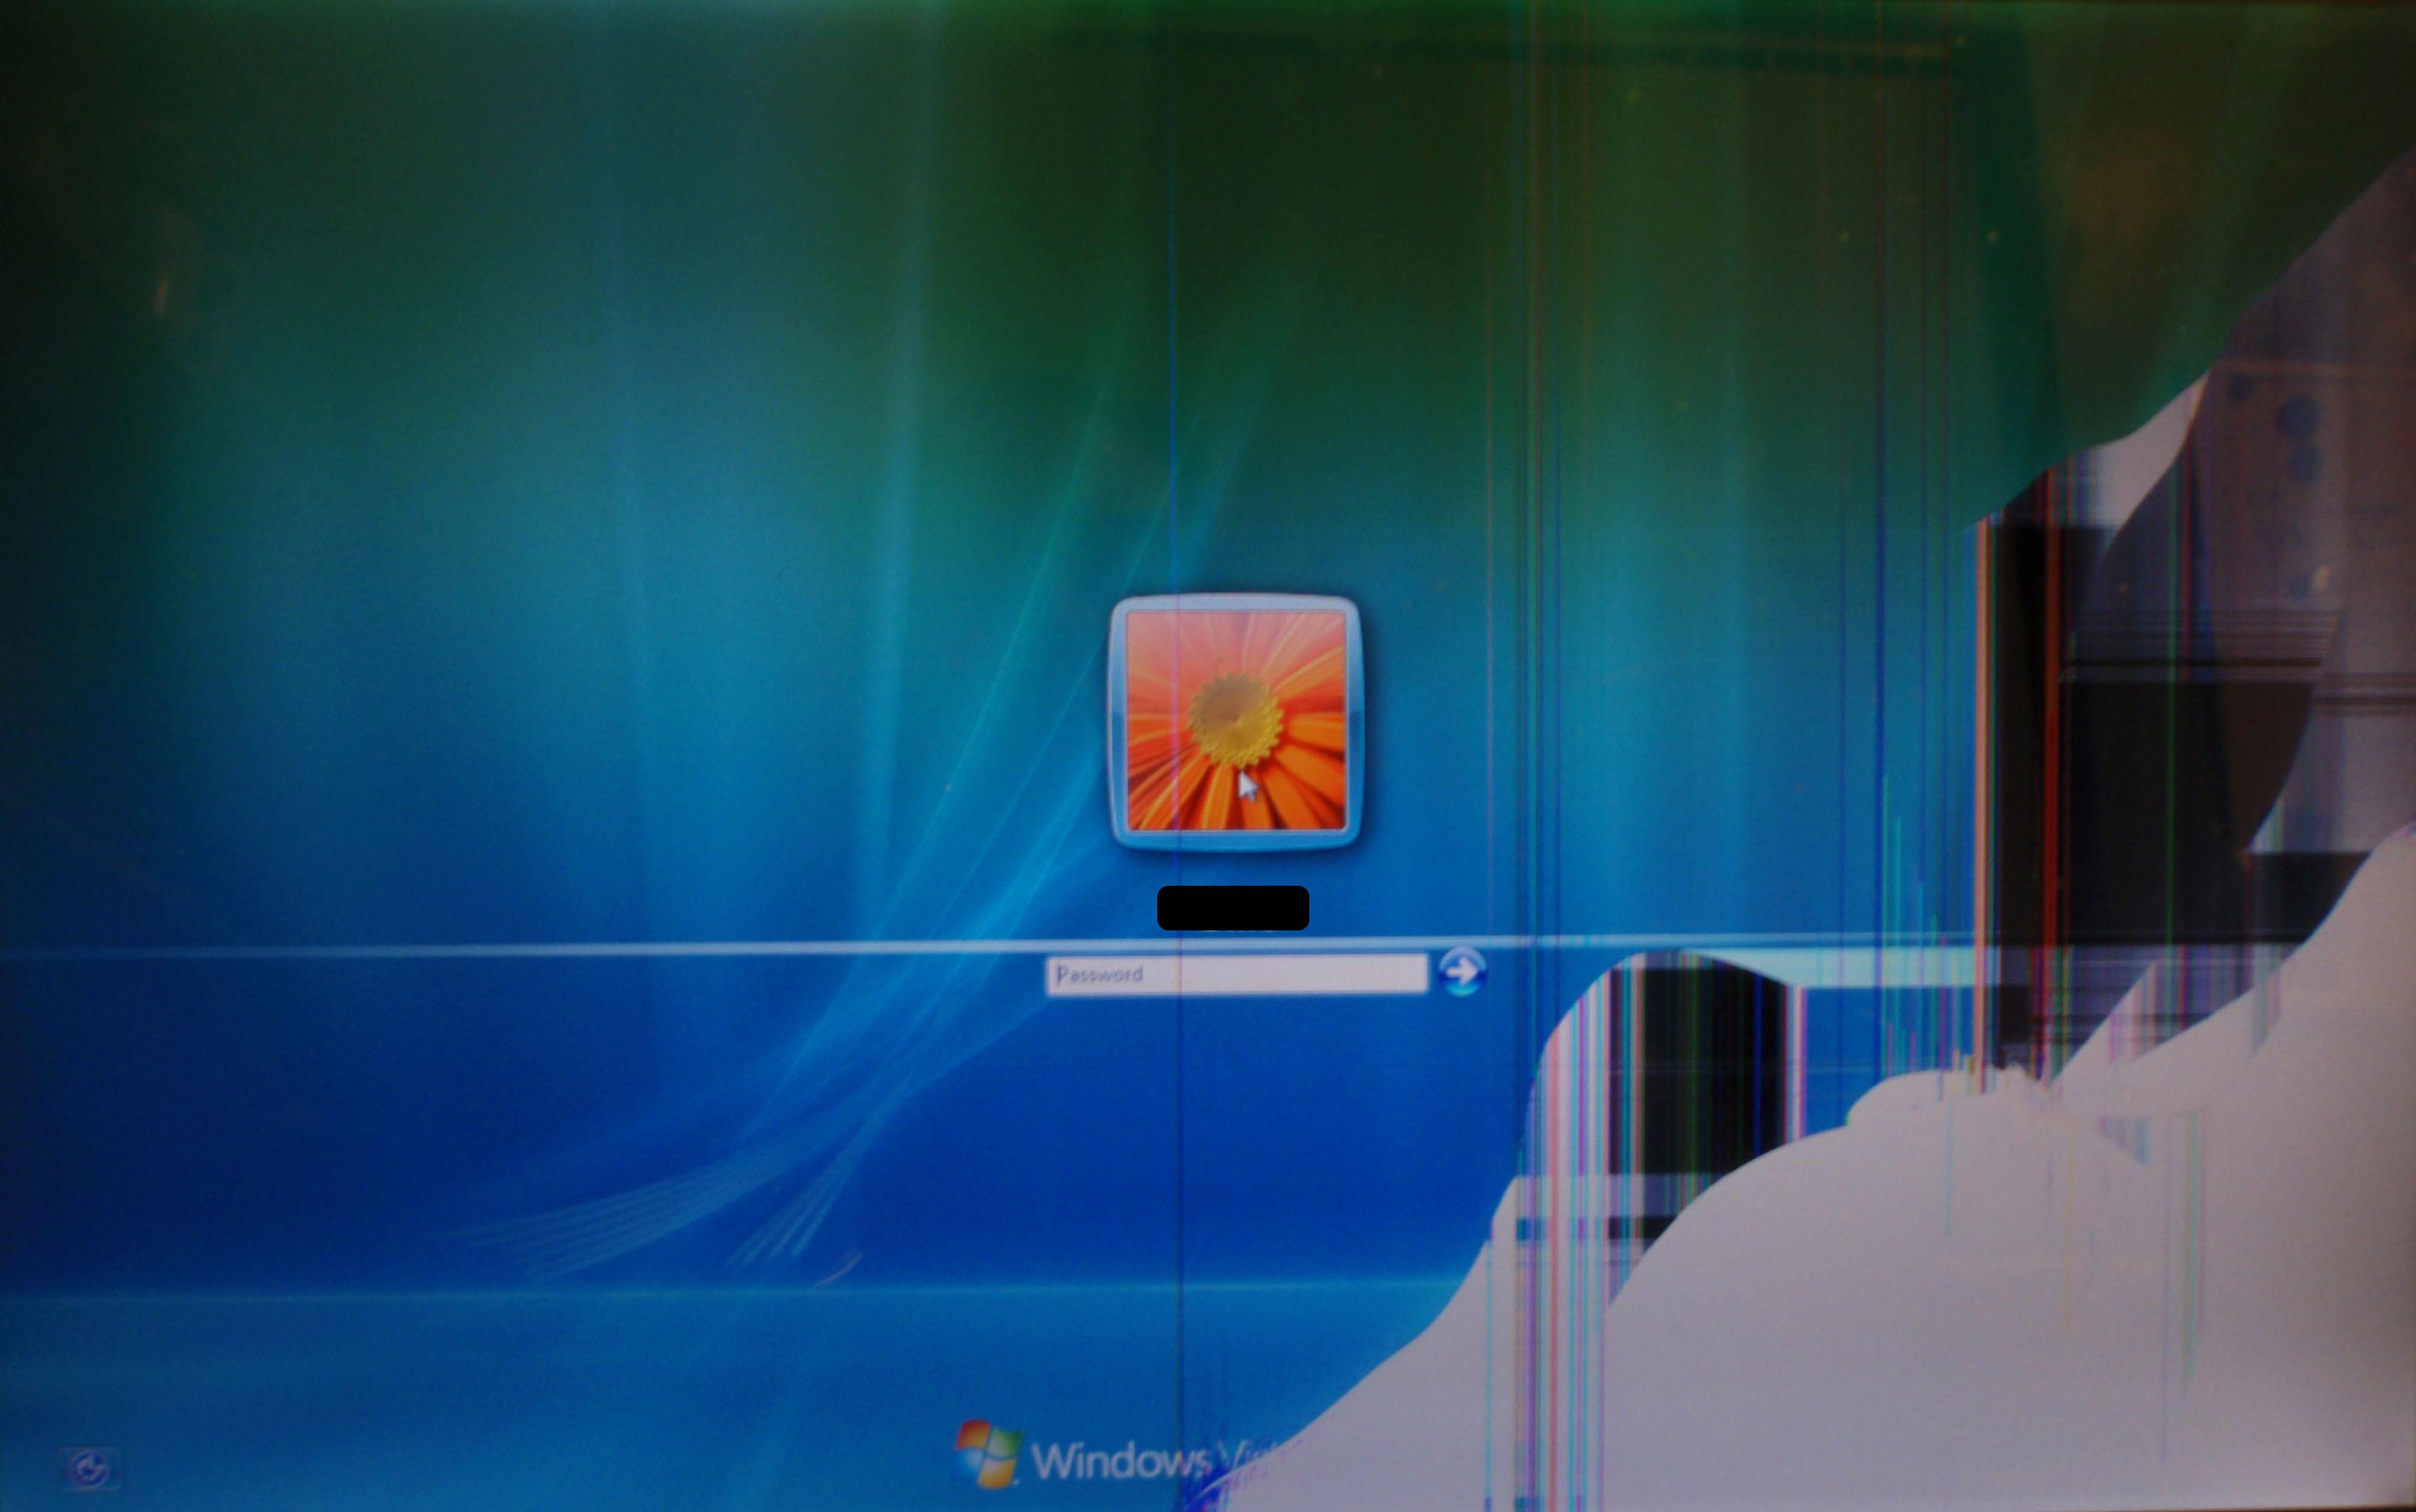 Cracked Screen Wallpaper Image